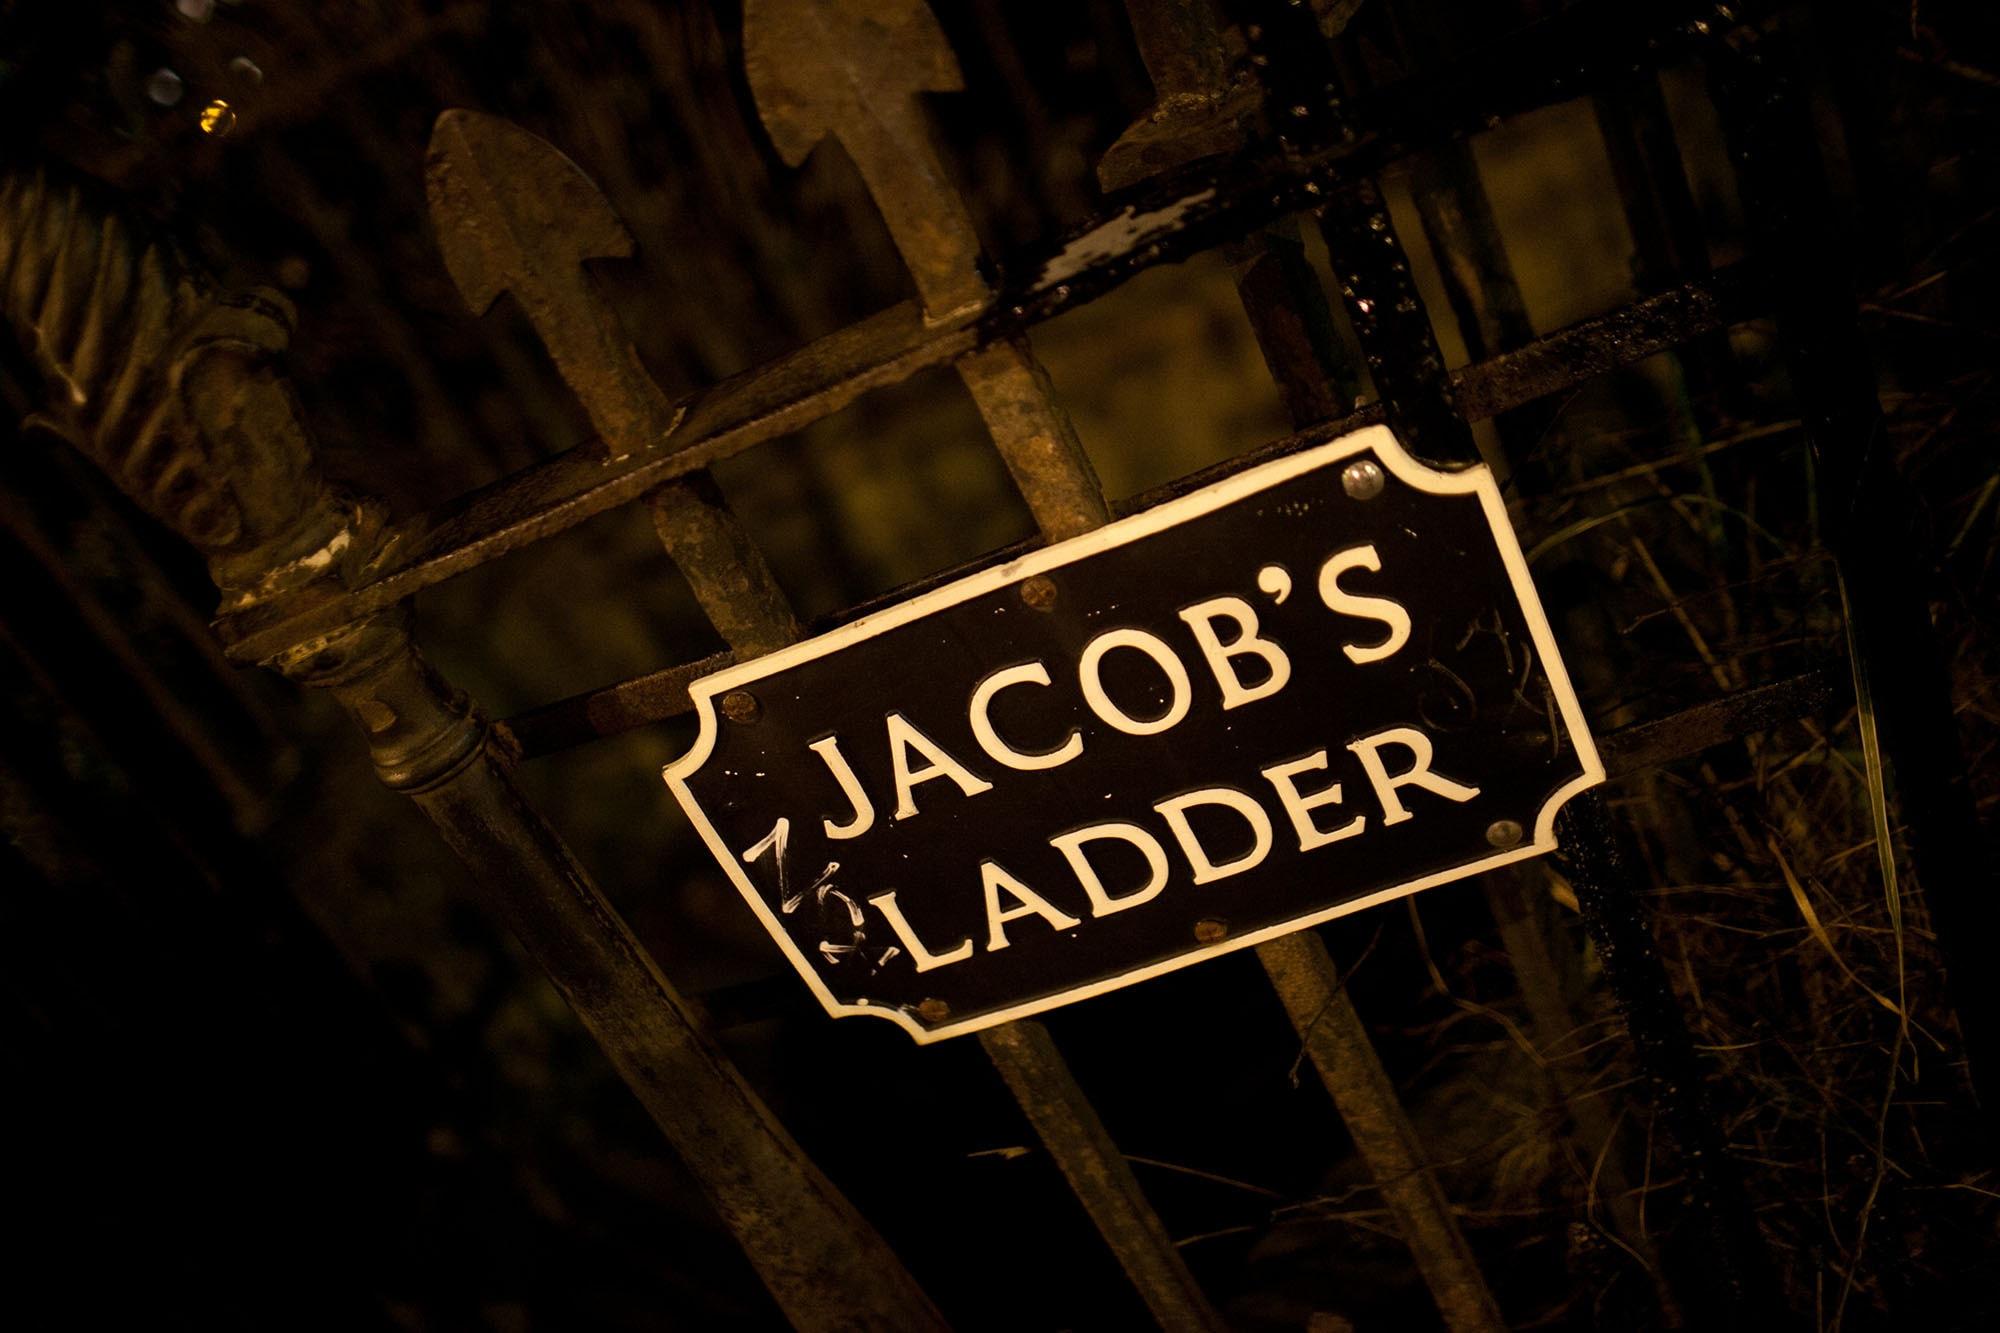 Jacob's Ladder in Edinburgh, Scotland